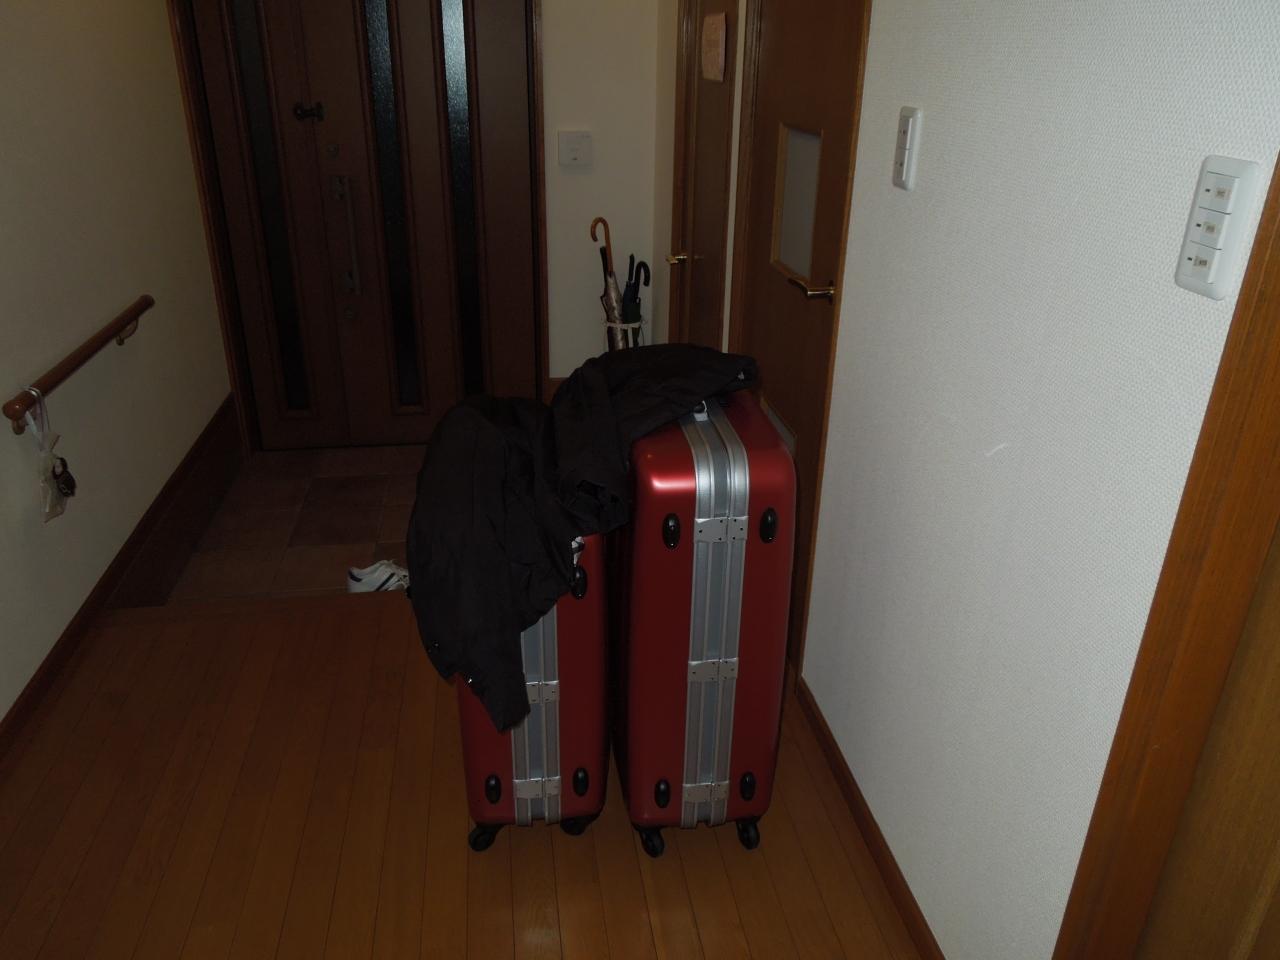 ed7e528725 グアム旅行記(ブログ) 一覧に戻る · 20時さあ!福岡空港へ‼︎<